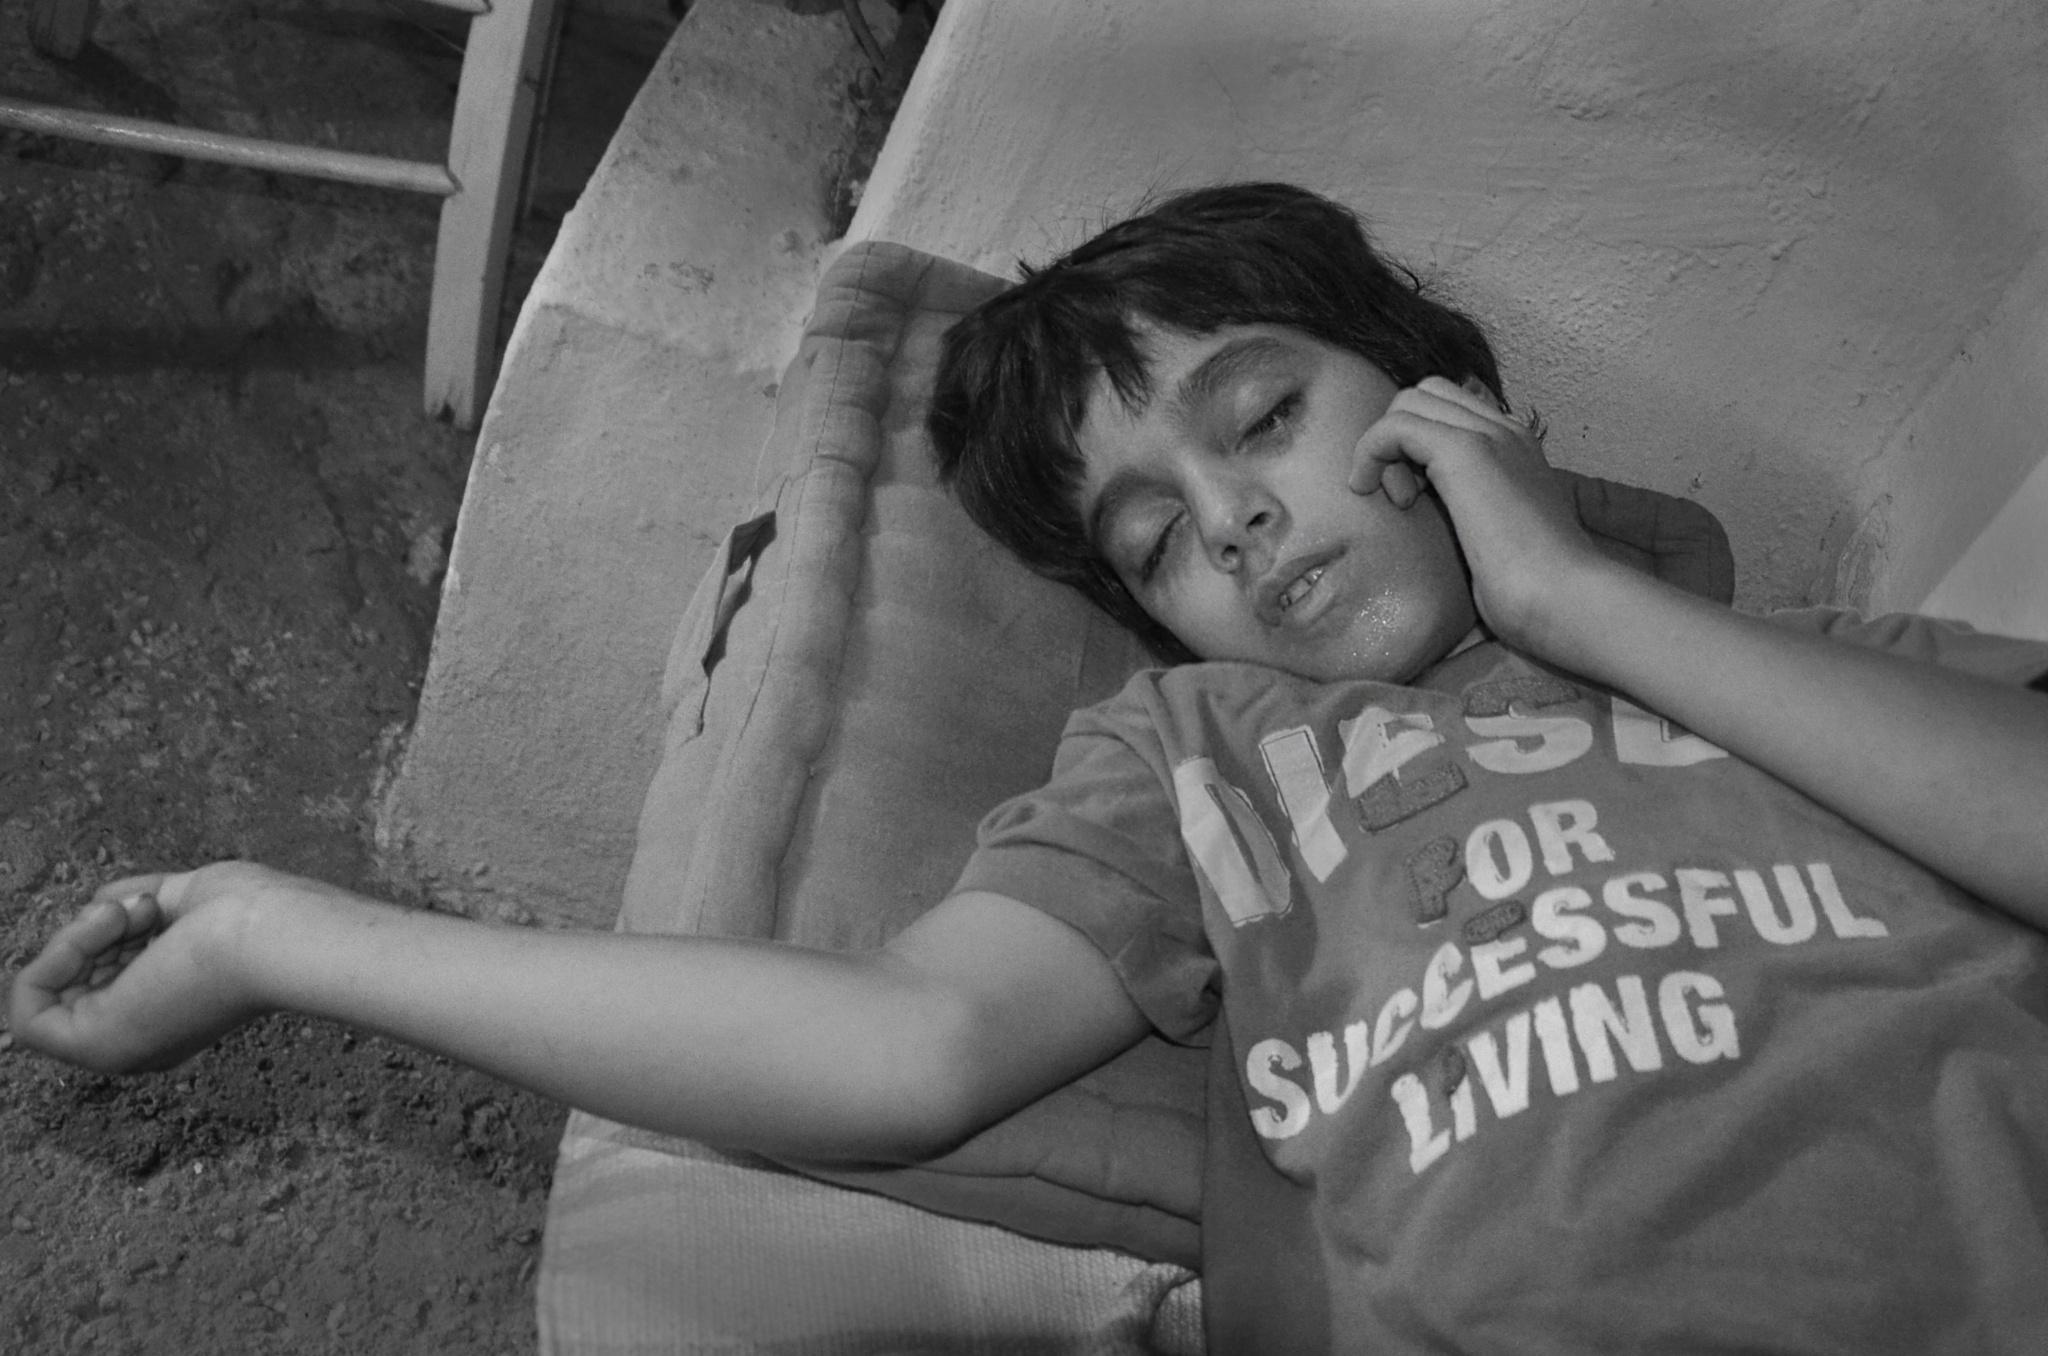 Byron sleeps 2012 by yiannis.lazaris